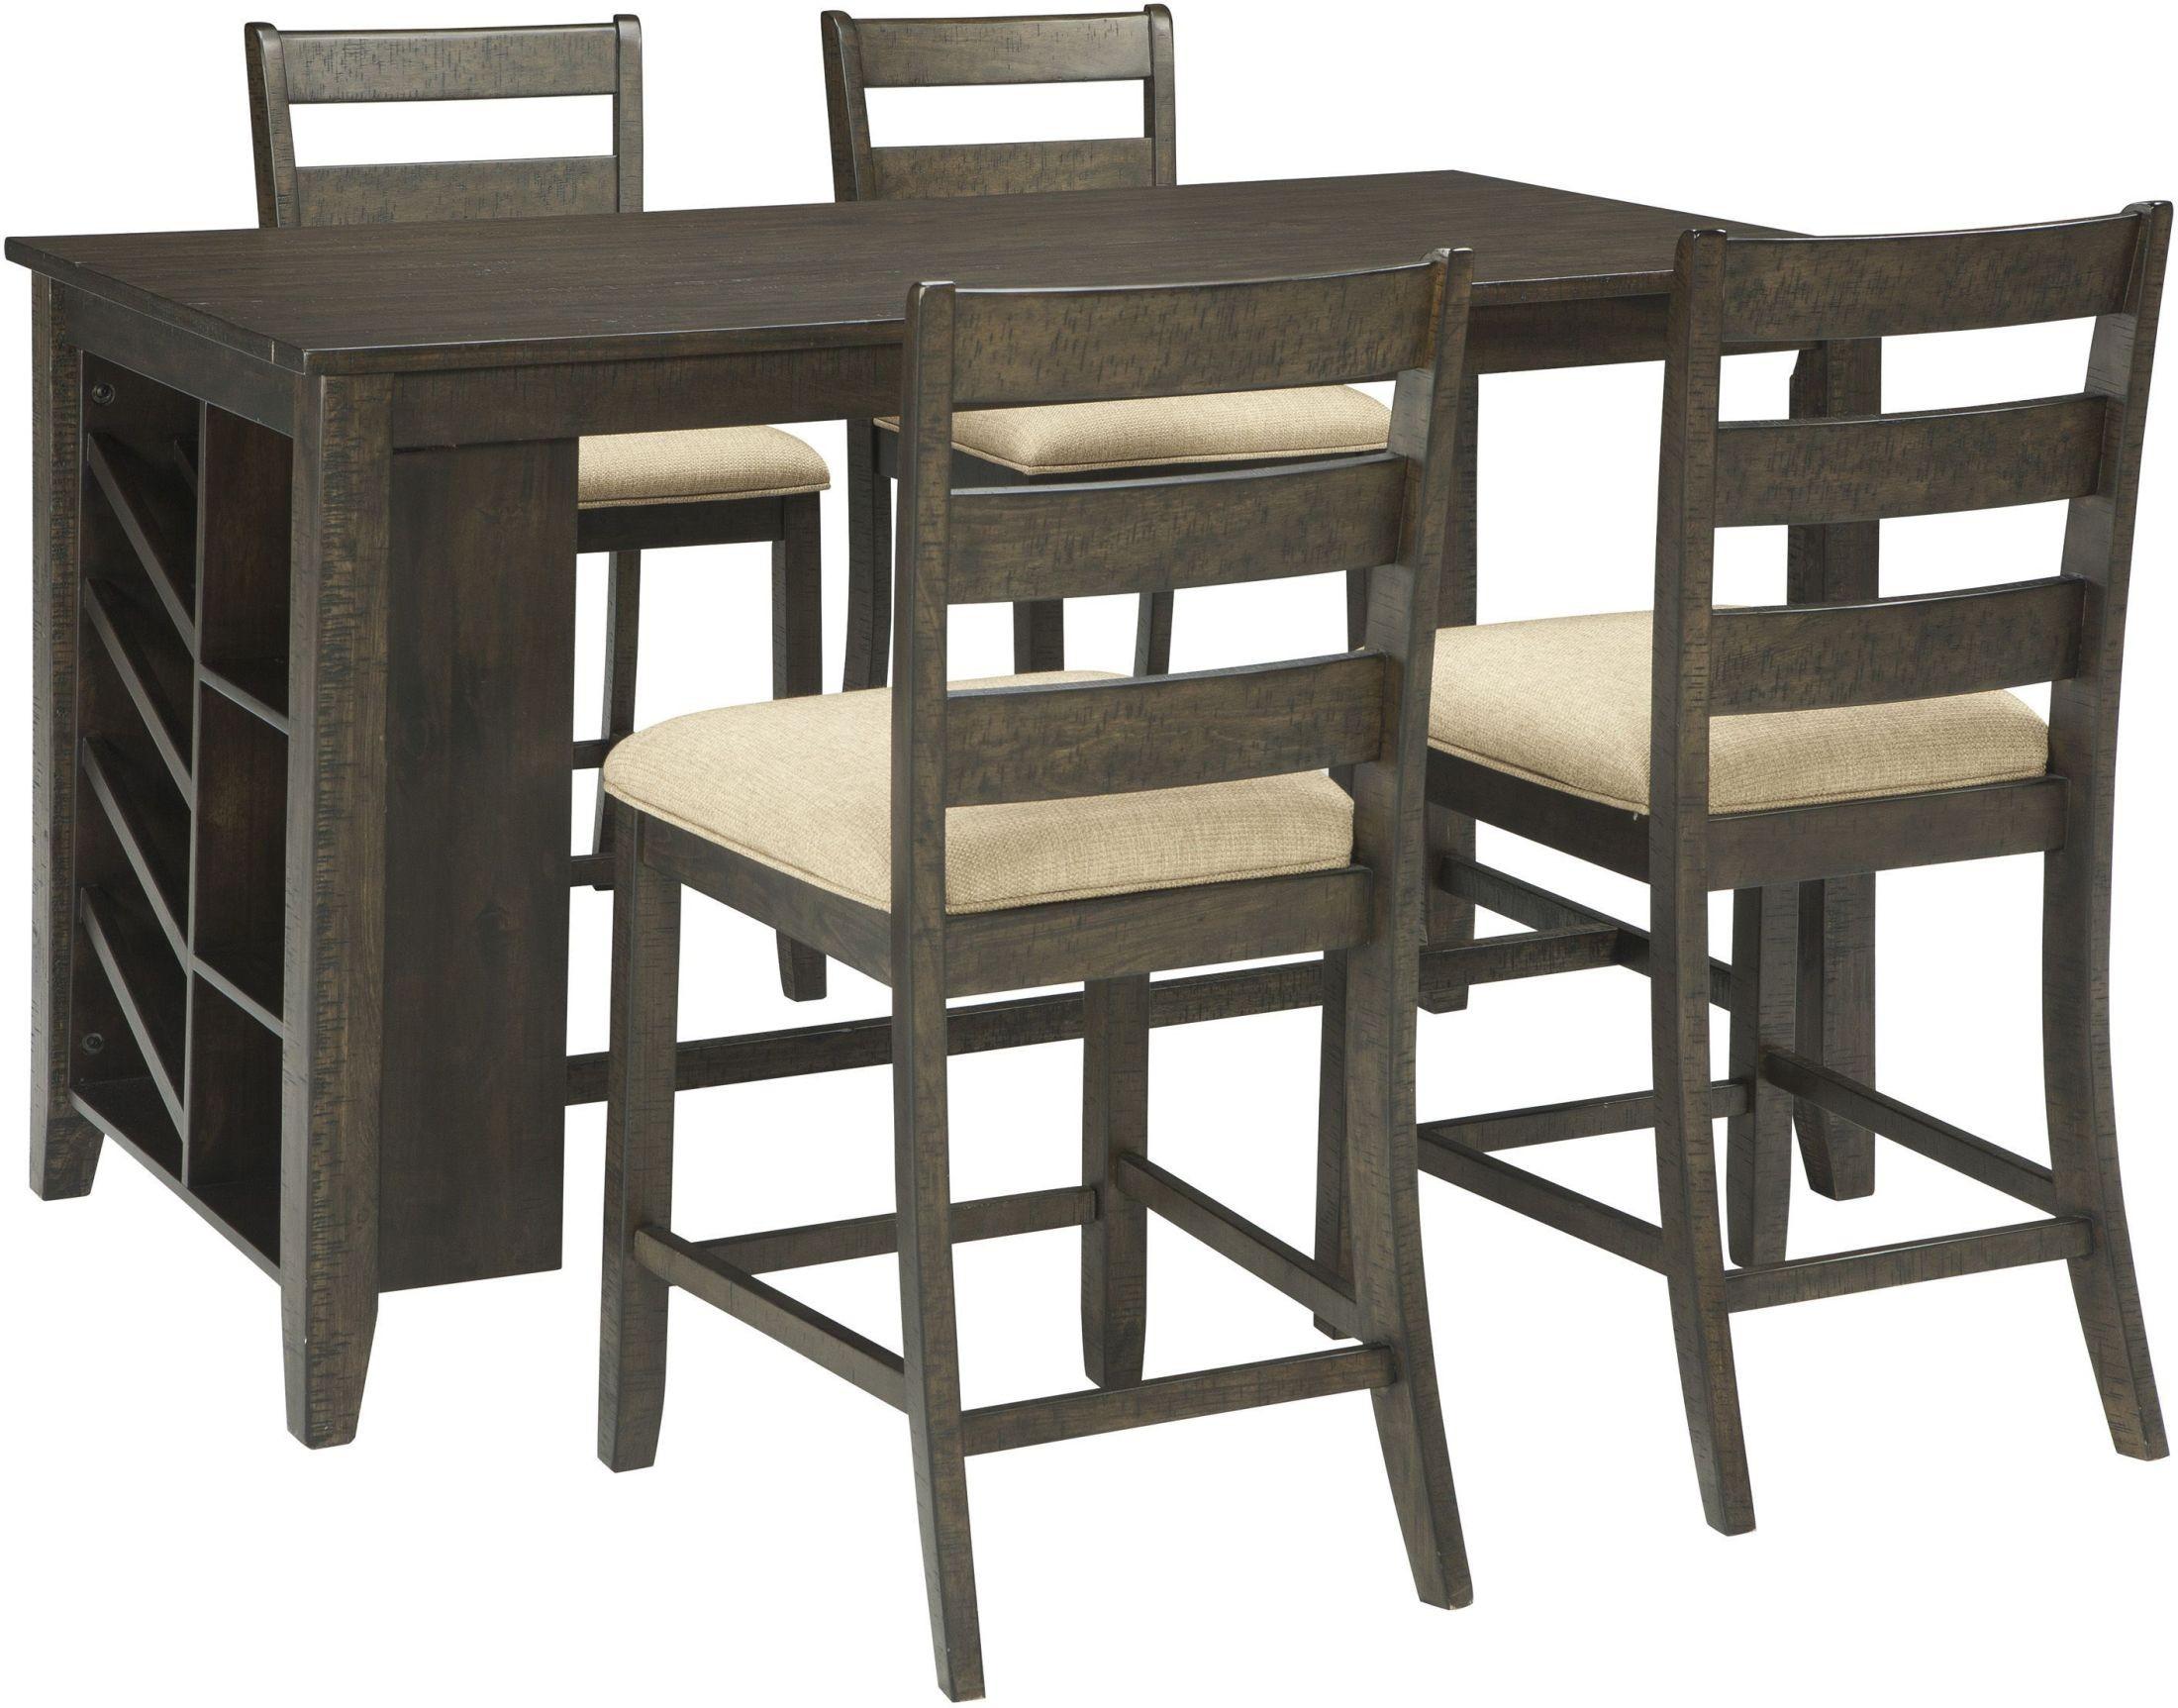 Rokane Light Brown Rectangular Counter Height Dining Room  : d397 32 1244 sw2 from colemanfurniture.com size 2200 x 1725 jpeg 467kB